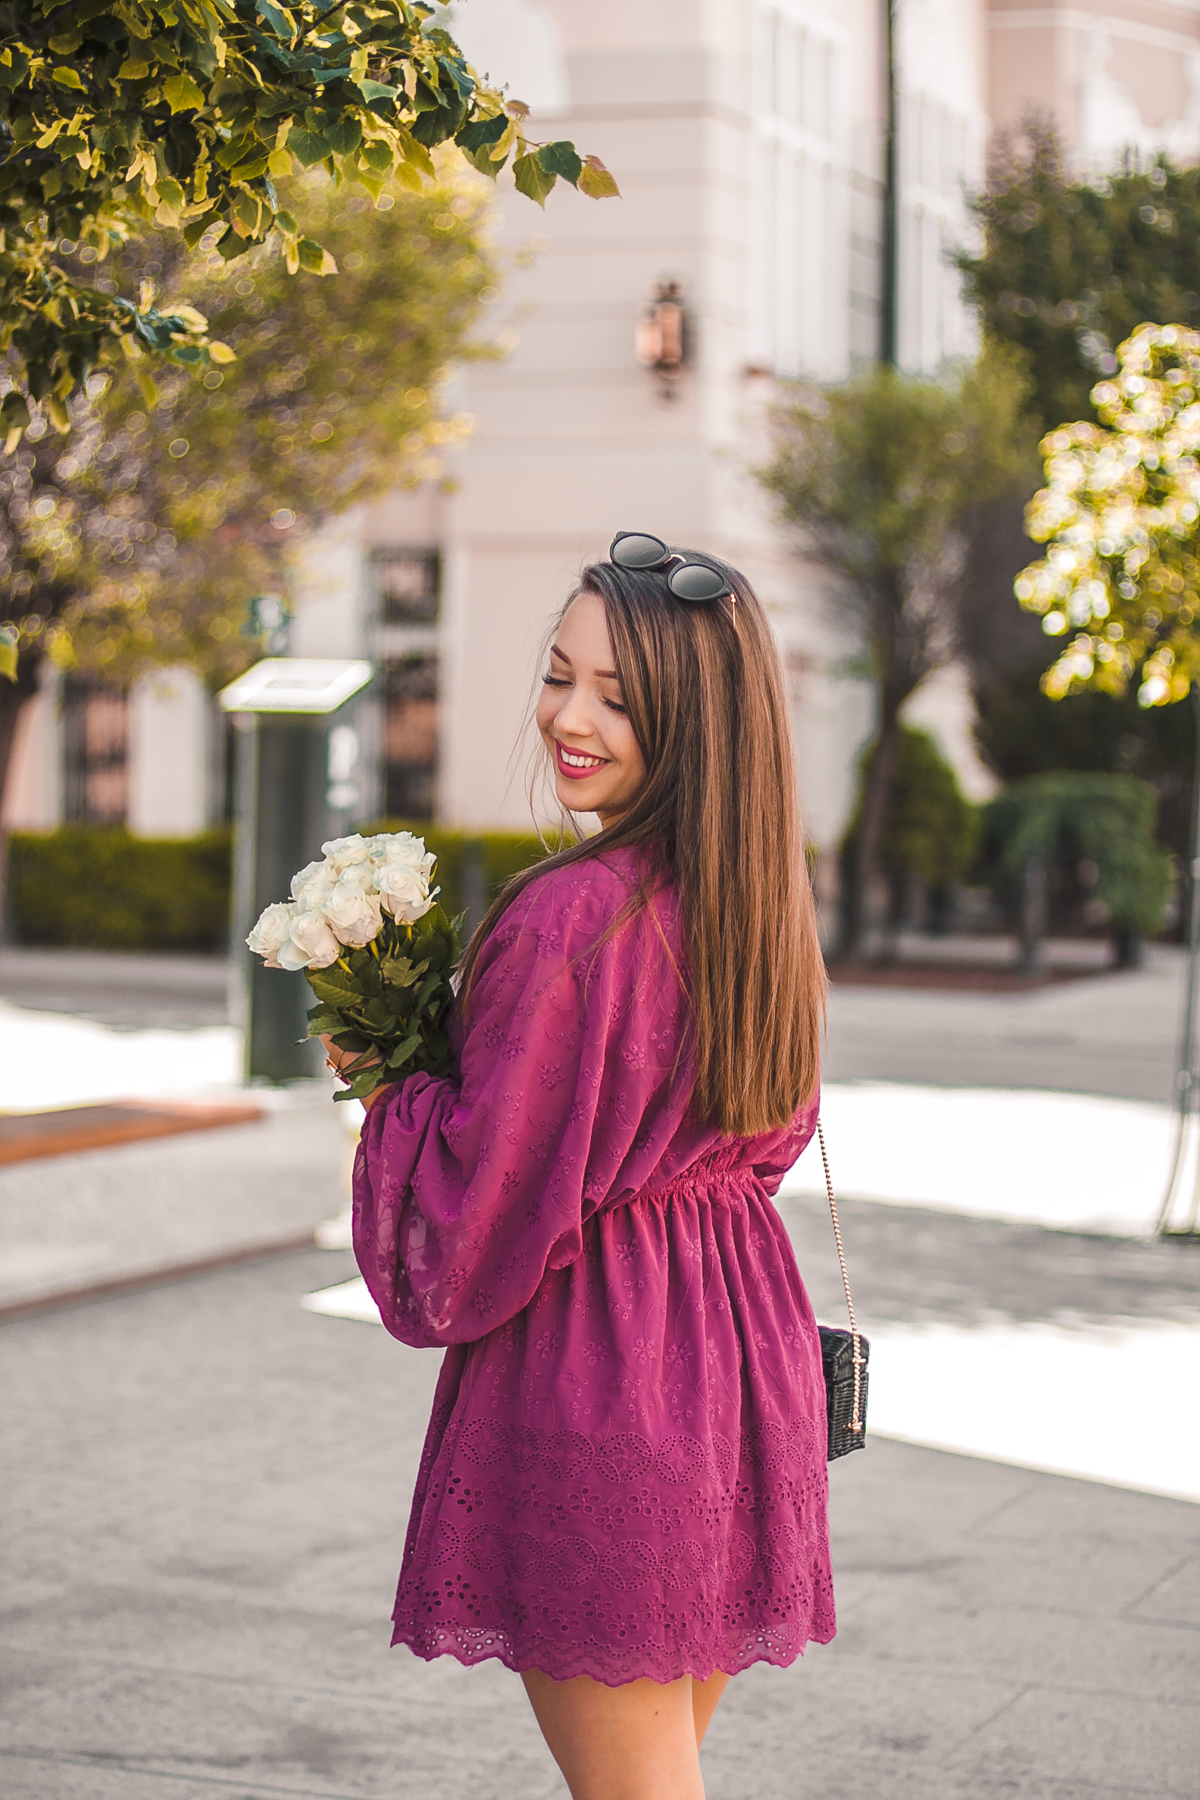 fioletowa sukienka koronkowa na-kd